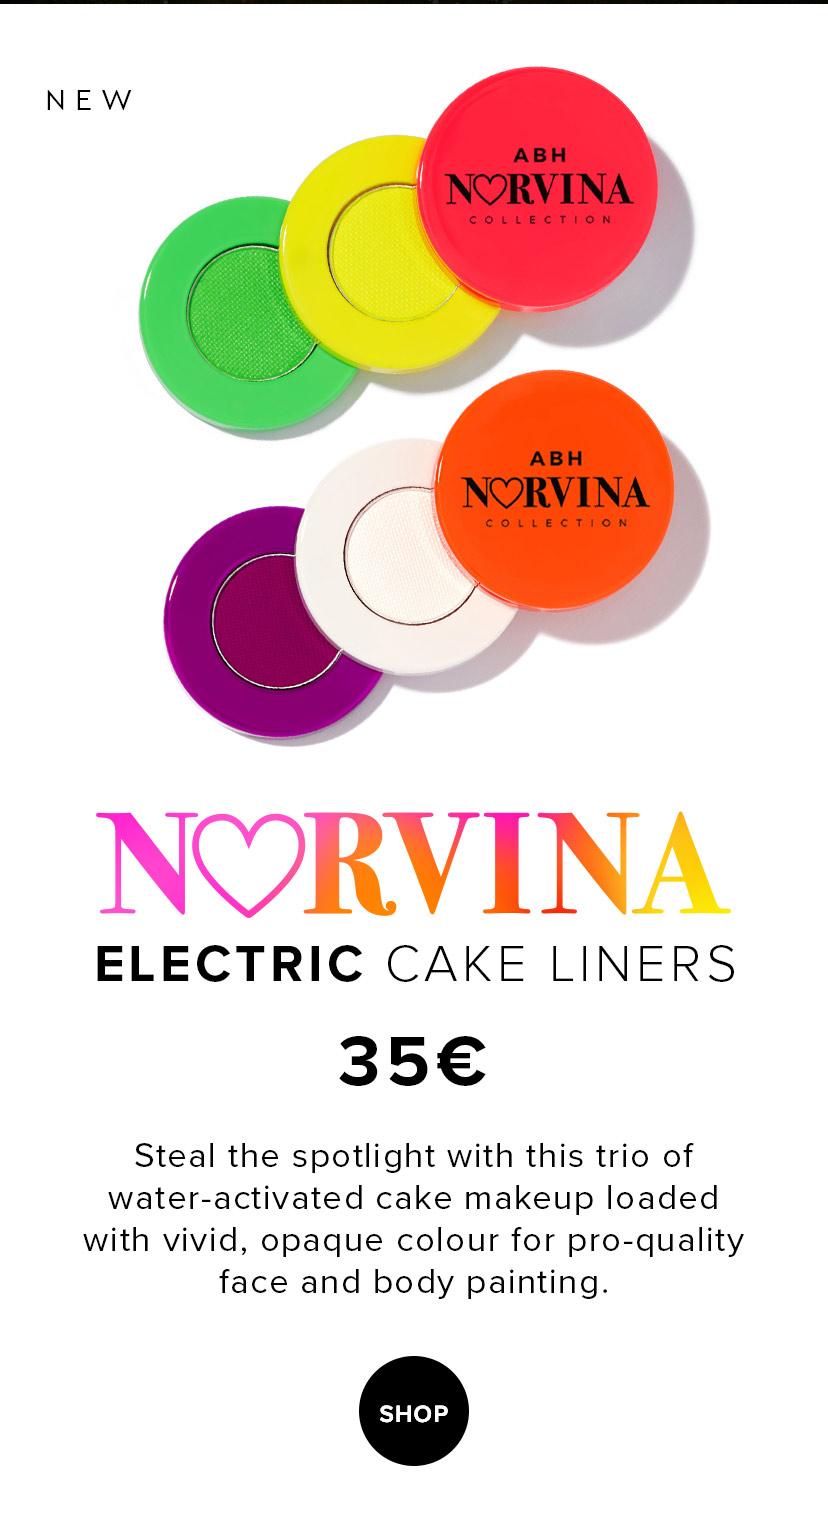 Norvina Cake Liners